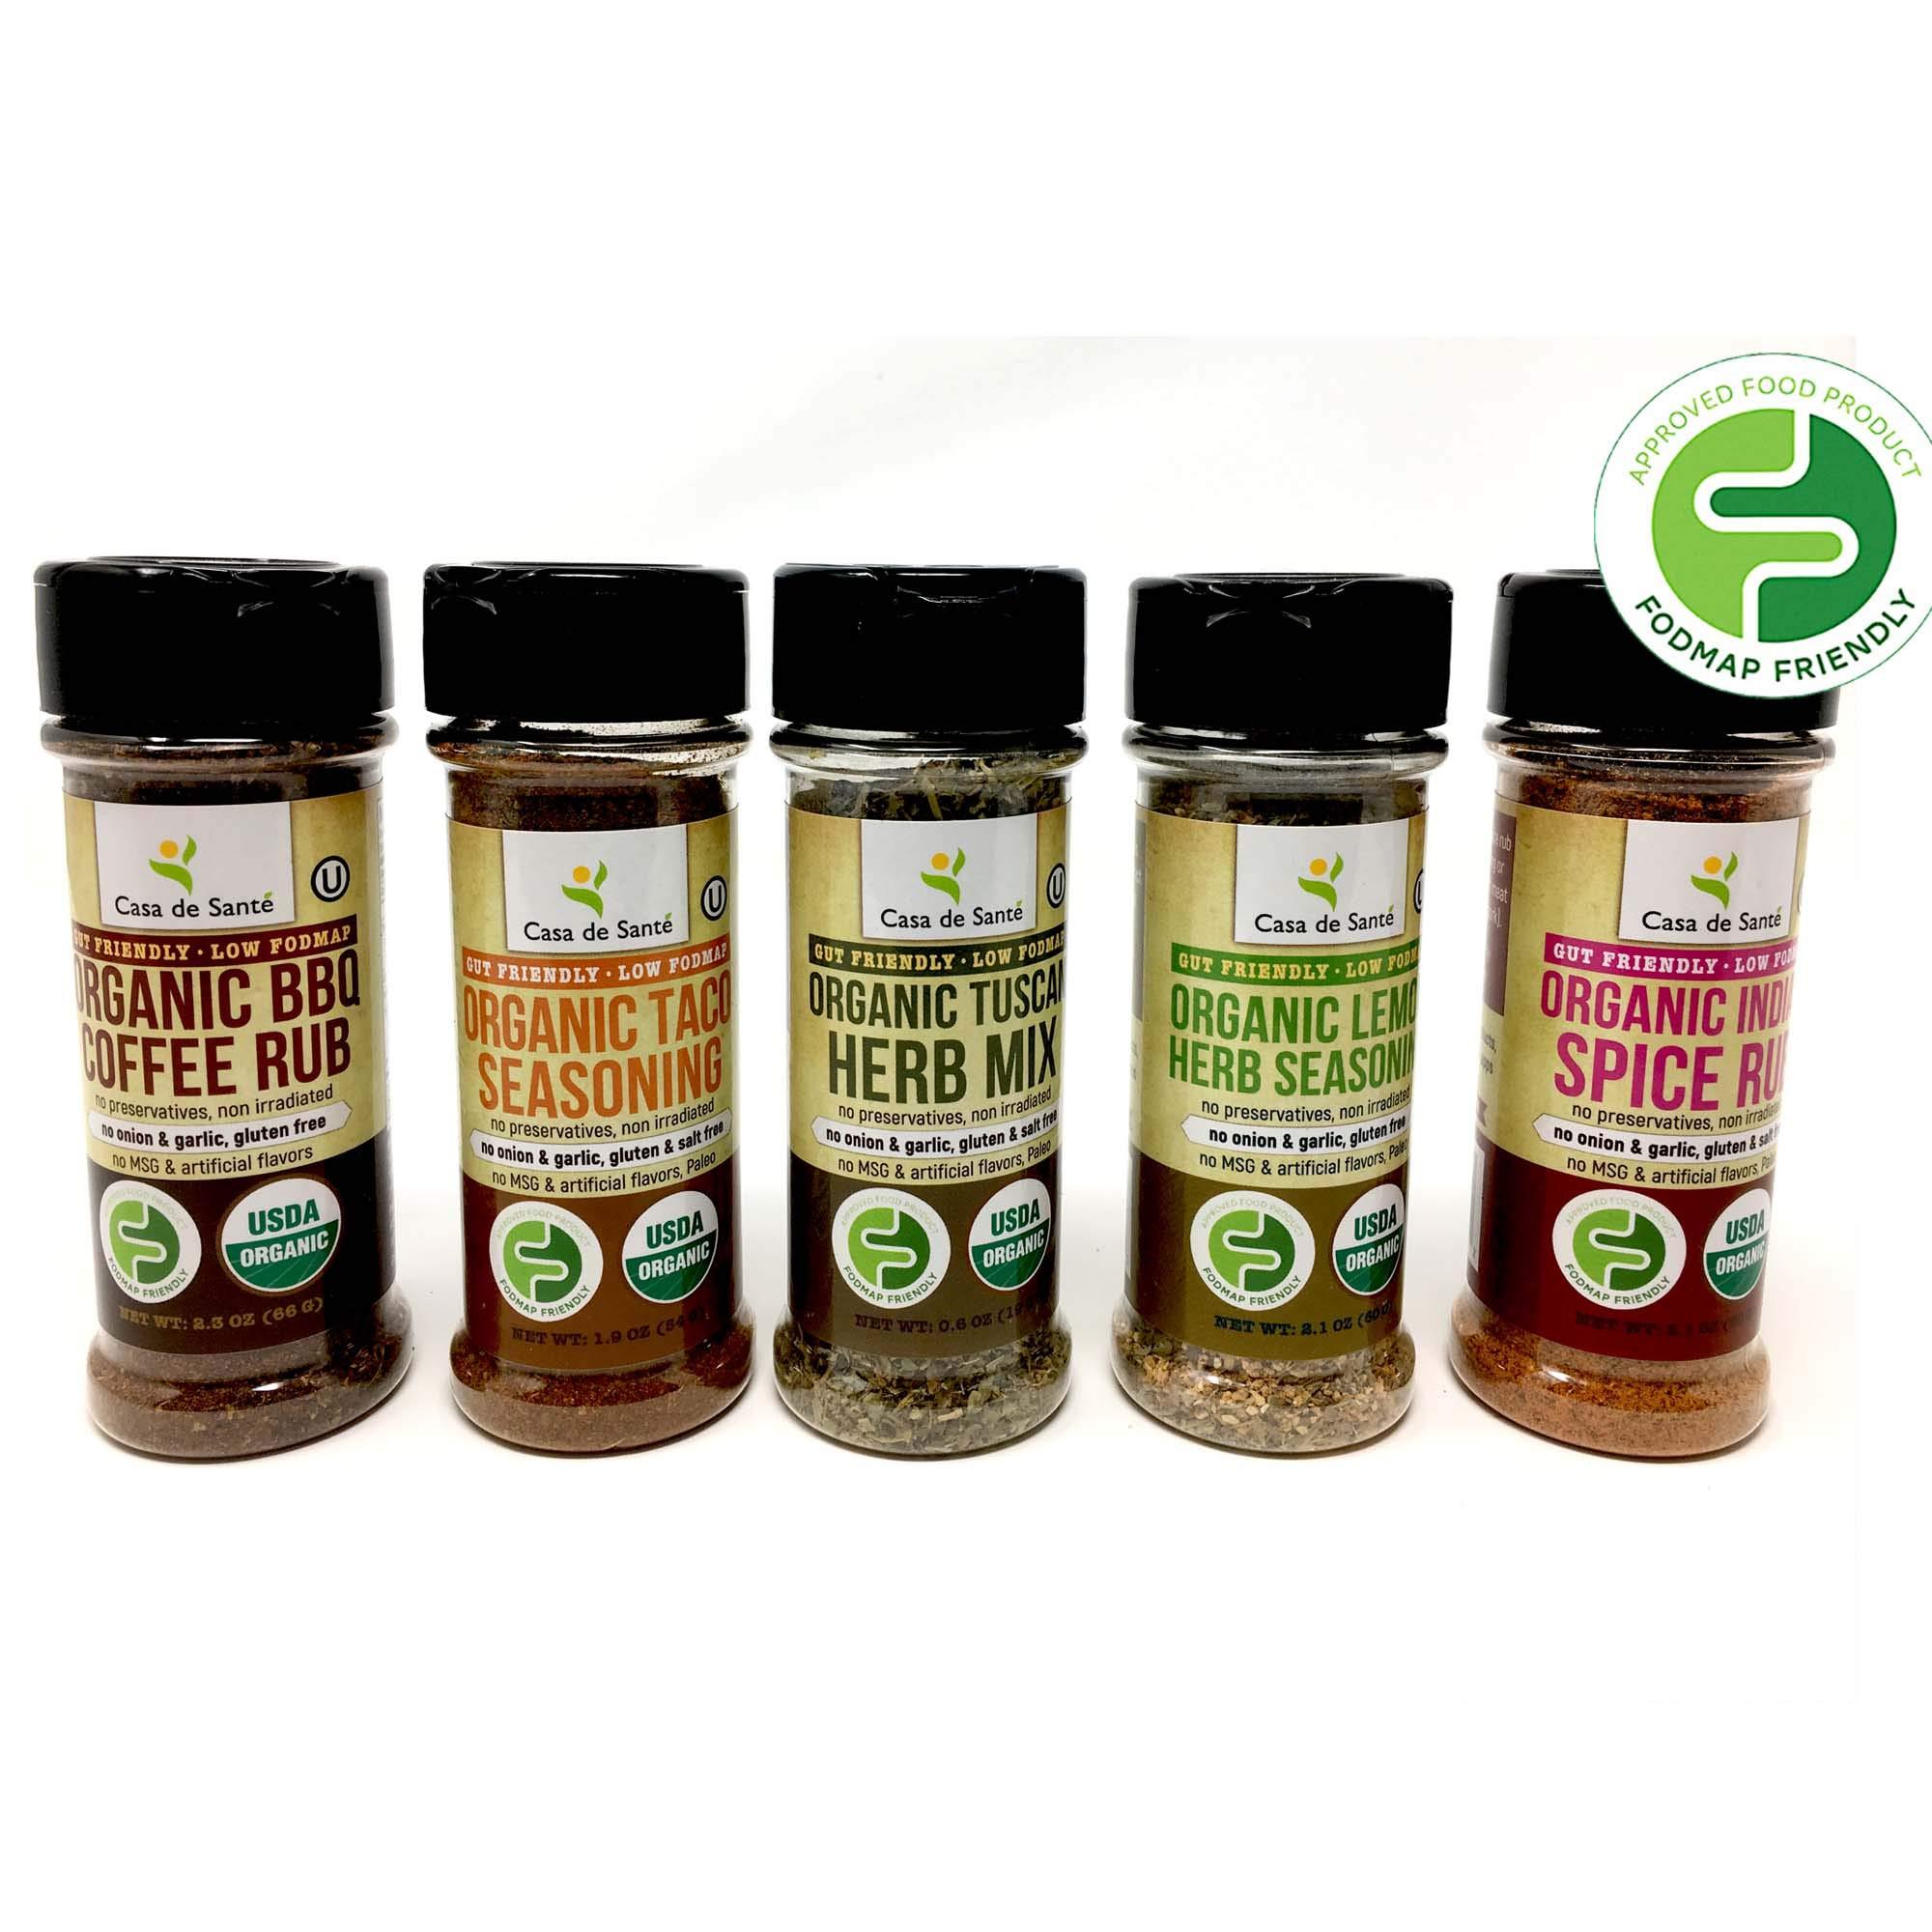 Organic Paleo Seasoning, Low FODMAP Diet Healthy Spices (Starter 5 Pack) | No Onion No Garlic, Gluten-Free, No Carb, Keto, Paleo, Whole30, Kosher, All Natural, Non GMO, Non Irradiated - Casa de Sante by Casa de Sante (Image #1)